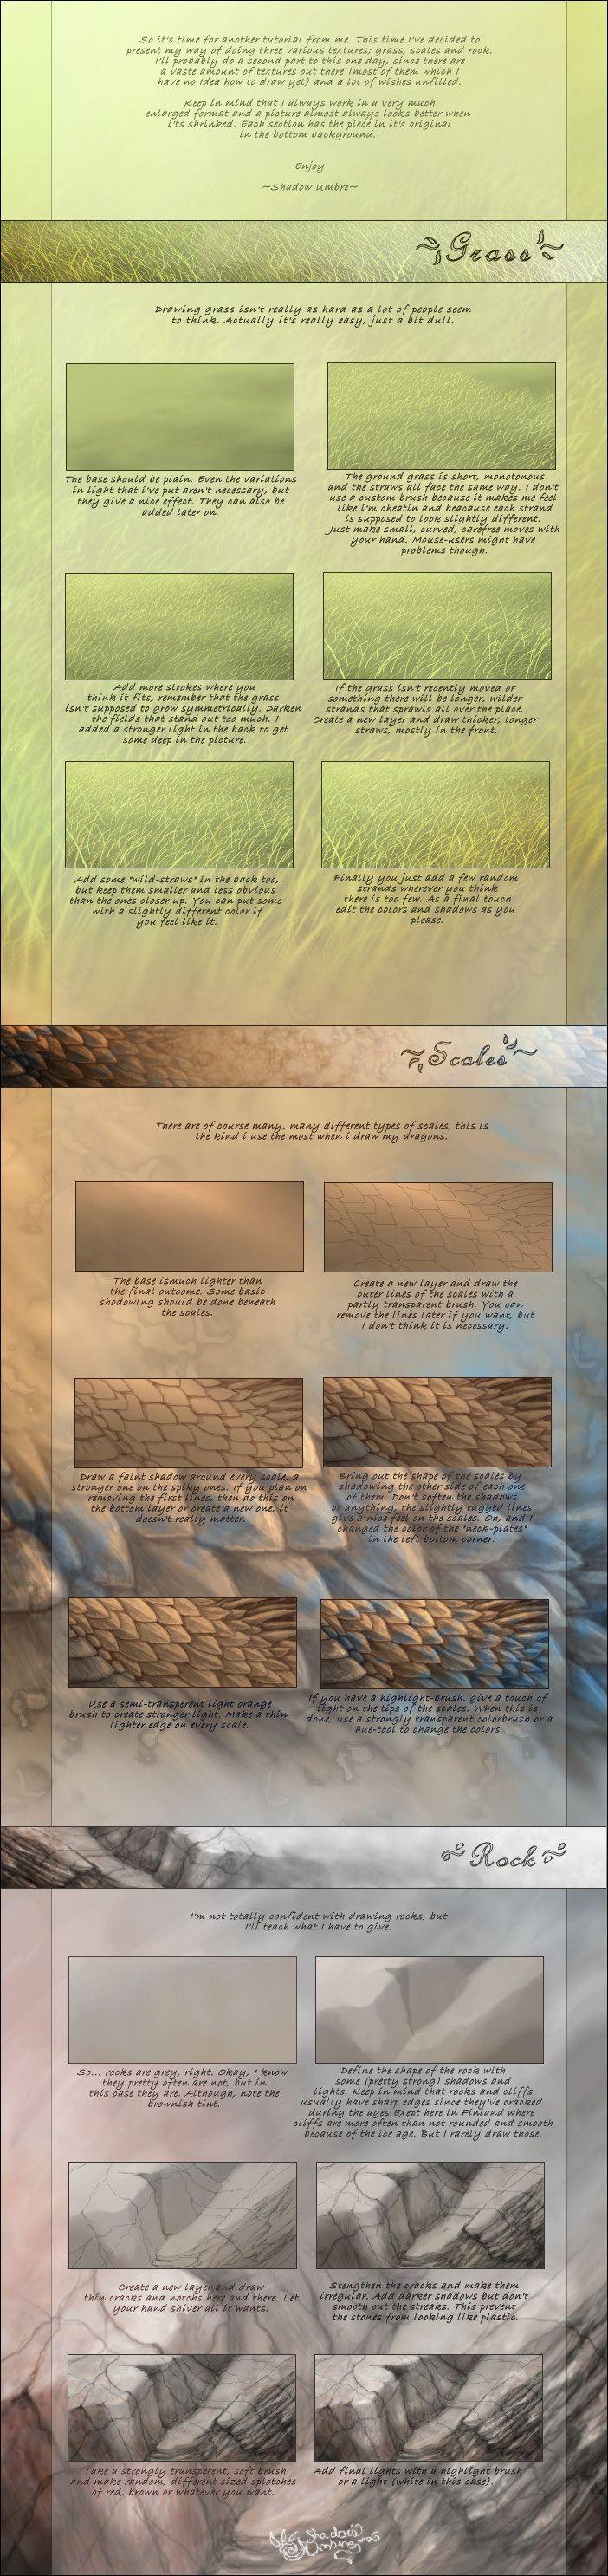 Various textures tutorial by MinnaSundberg on deviantART via cgpin.com